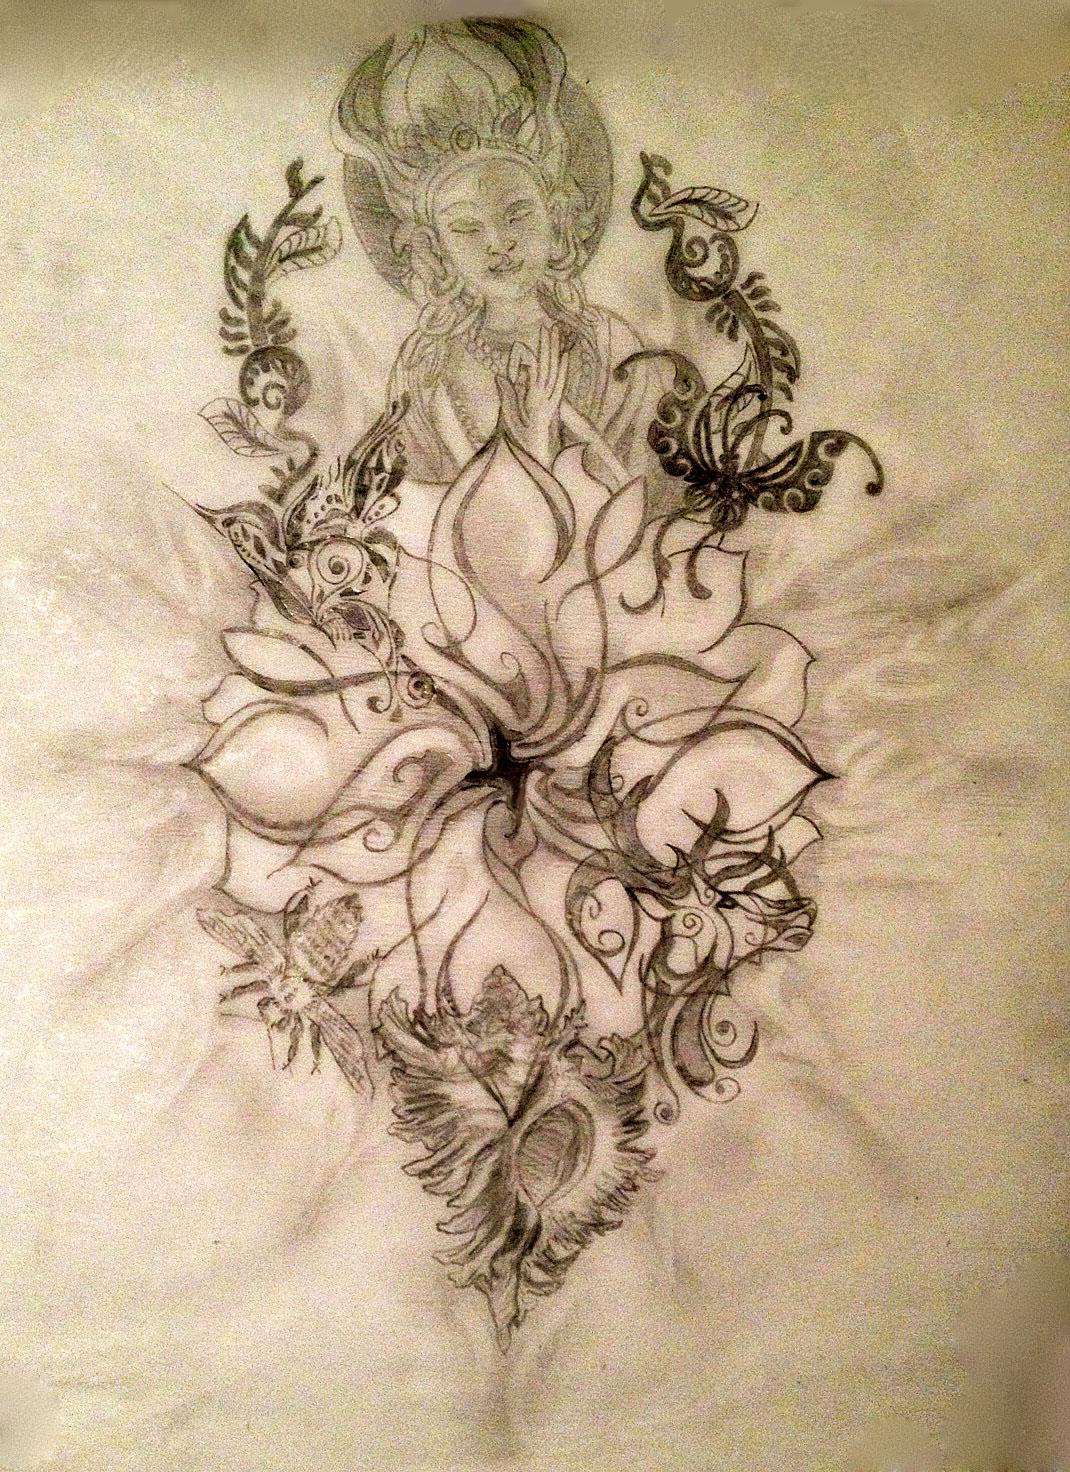 Lotus symbolism tania maries blog sacred tattoo design 2 izmirmasajfo Gallery